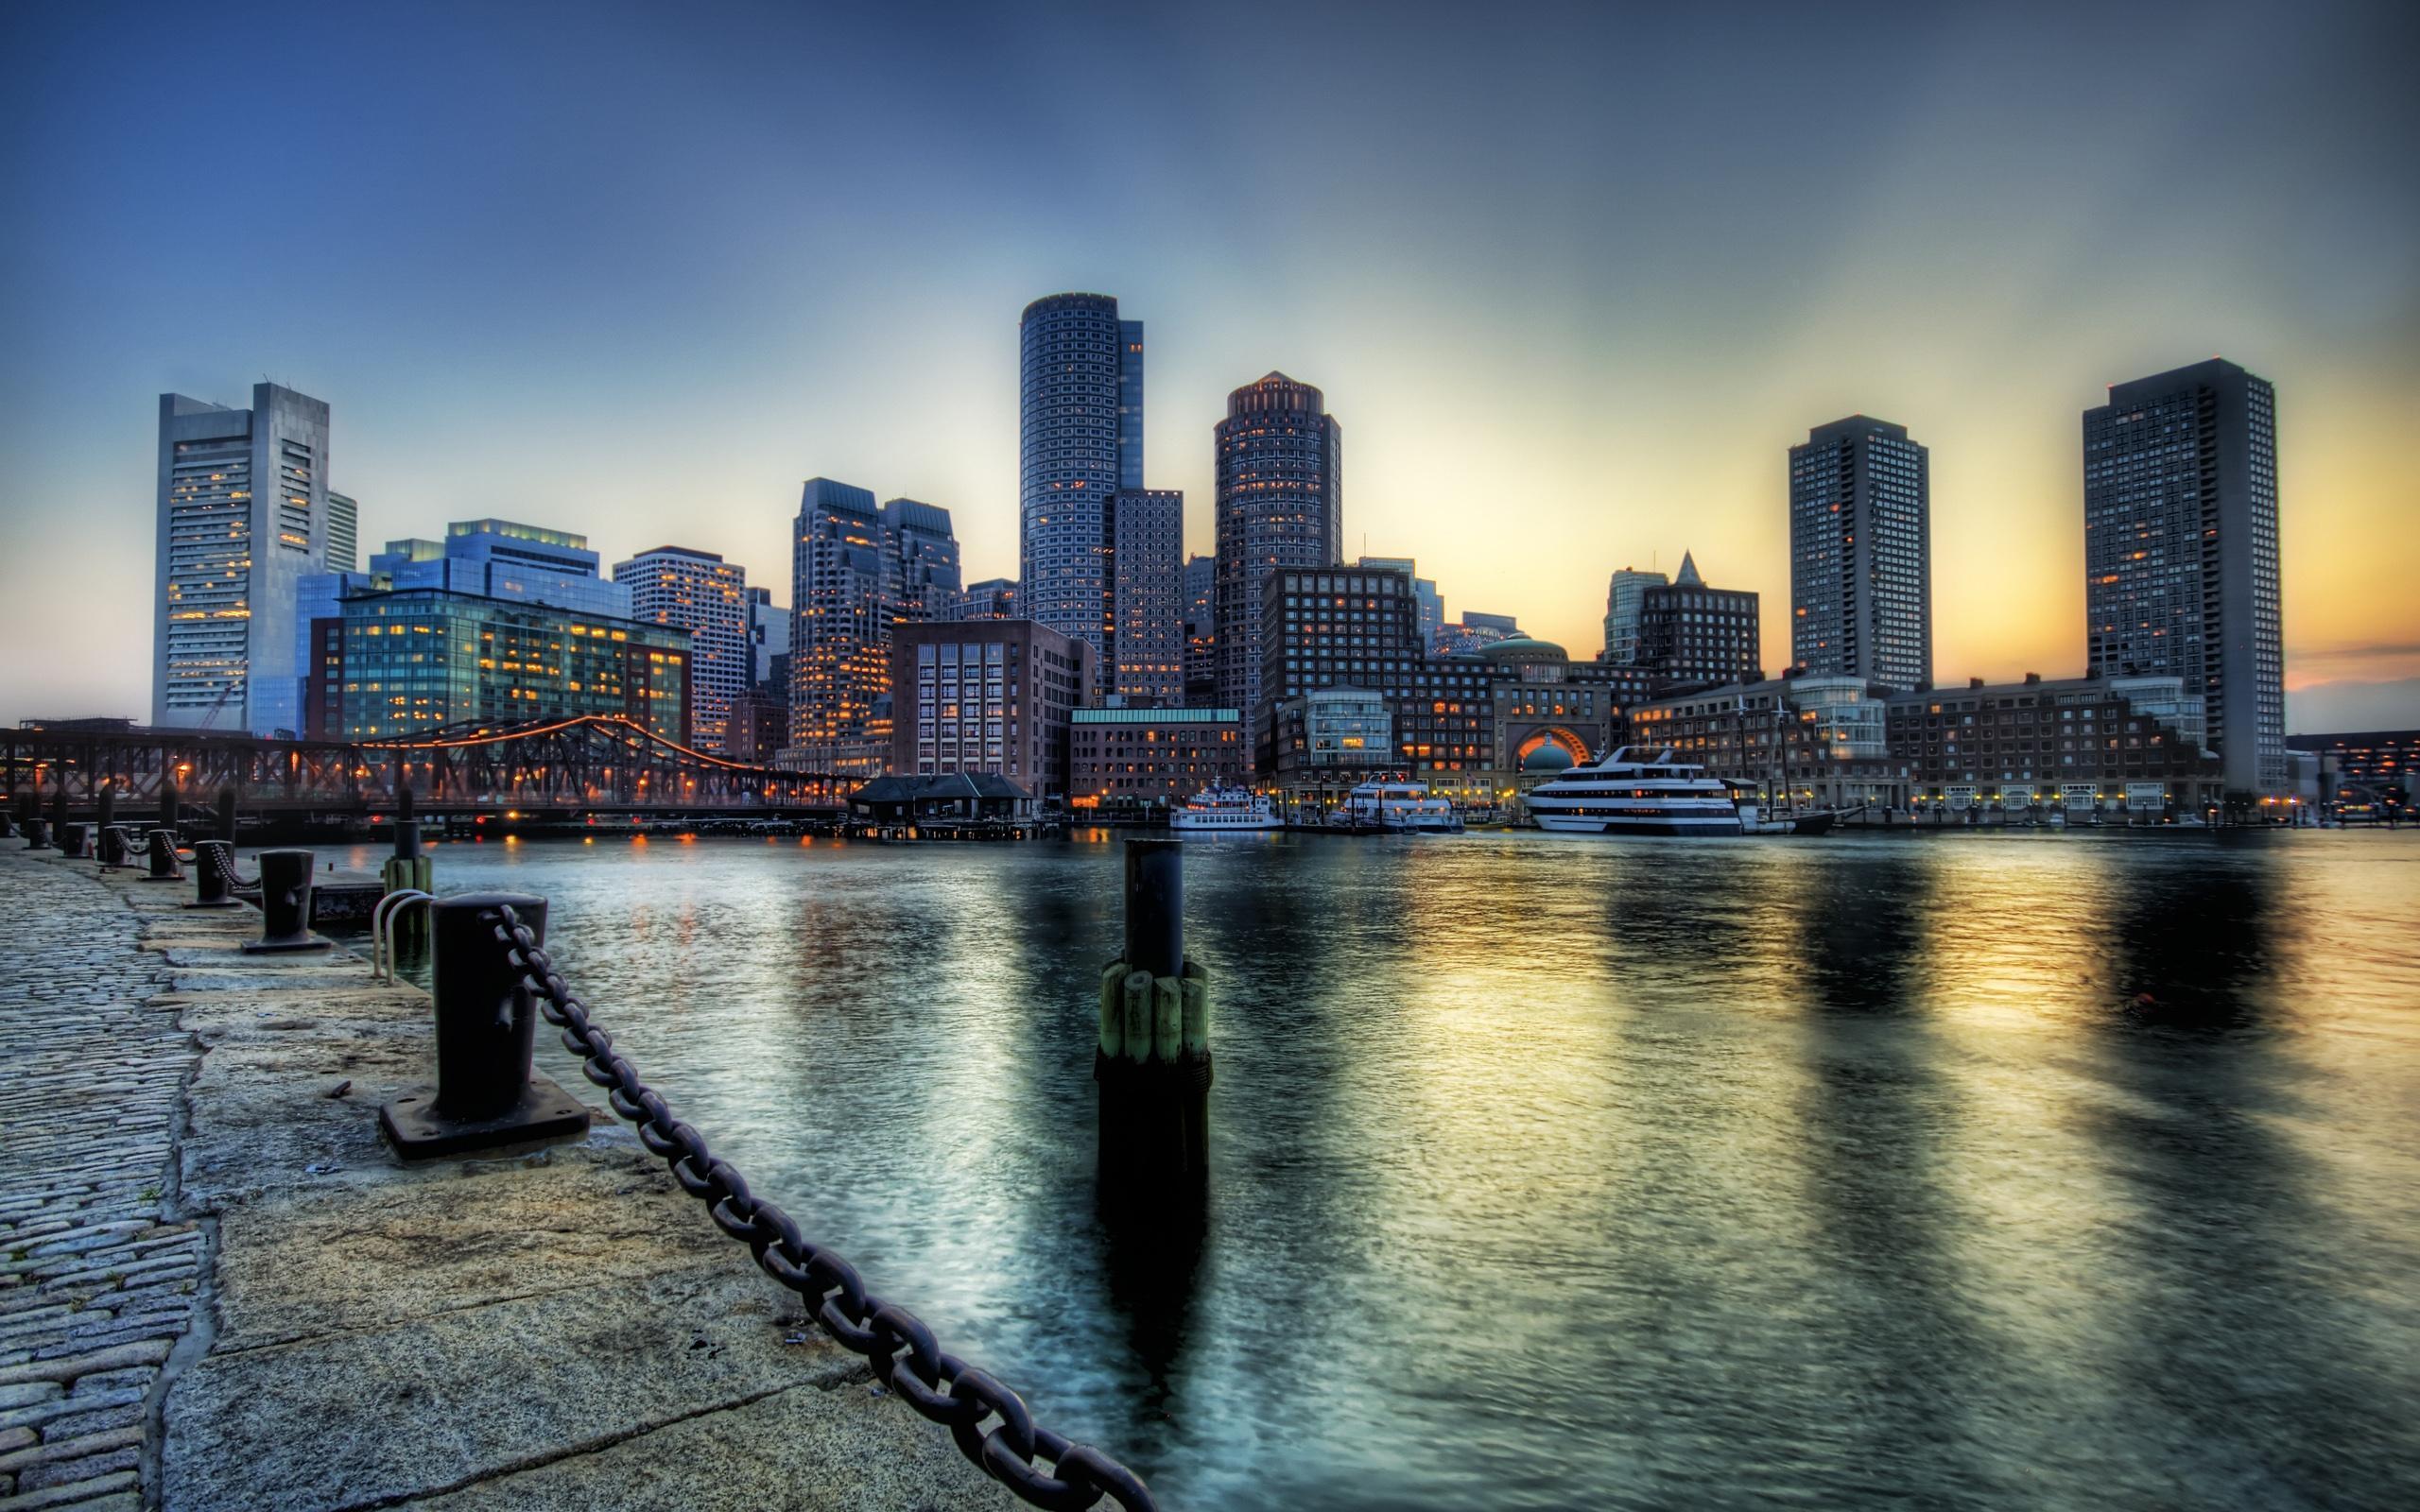 Boston Wallpapers - Top Free Boston